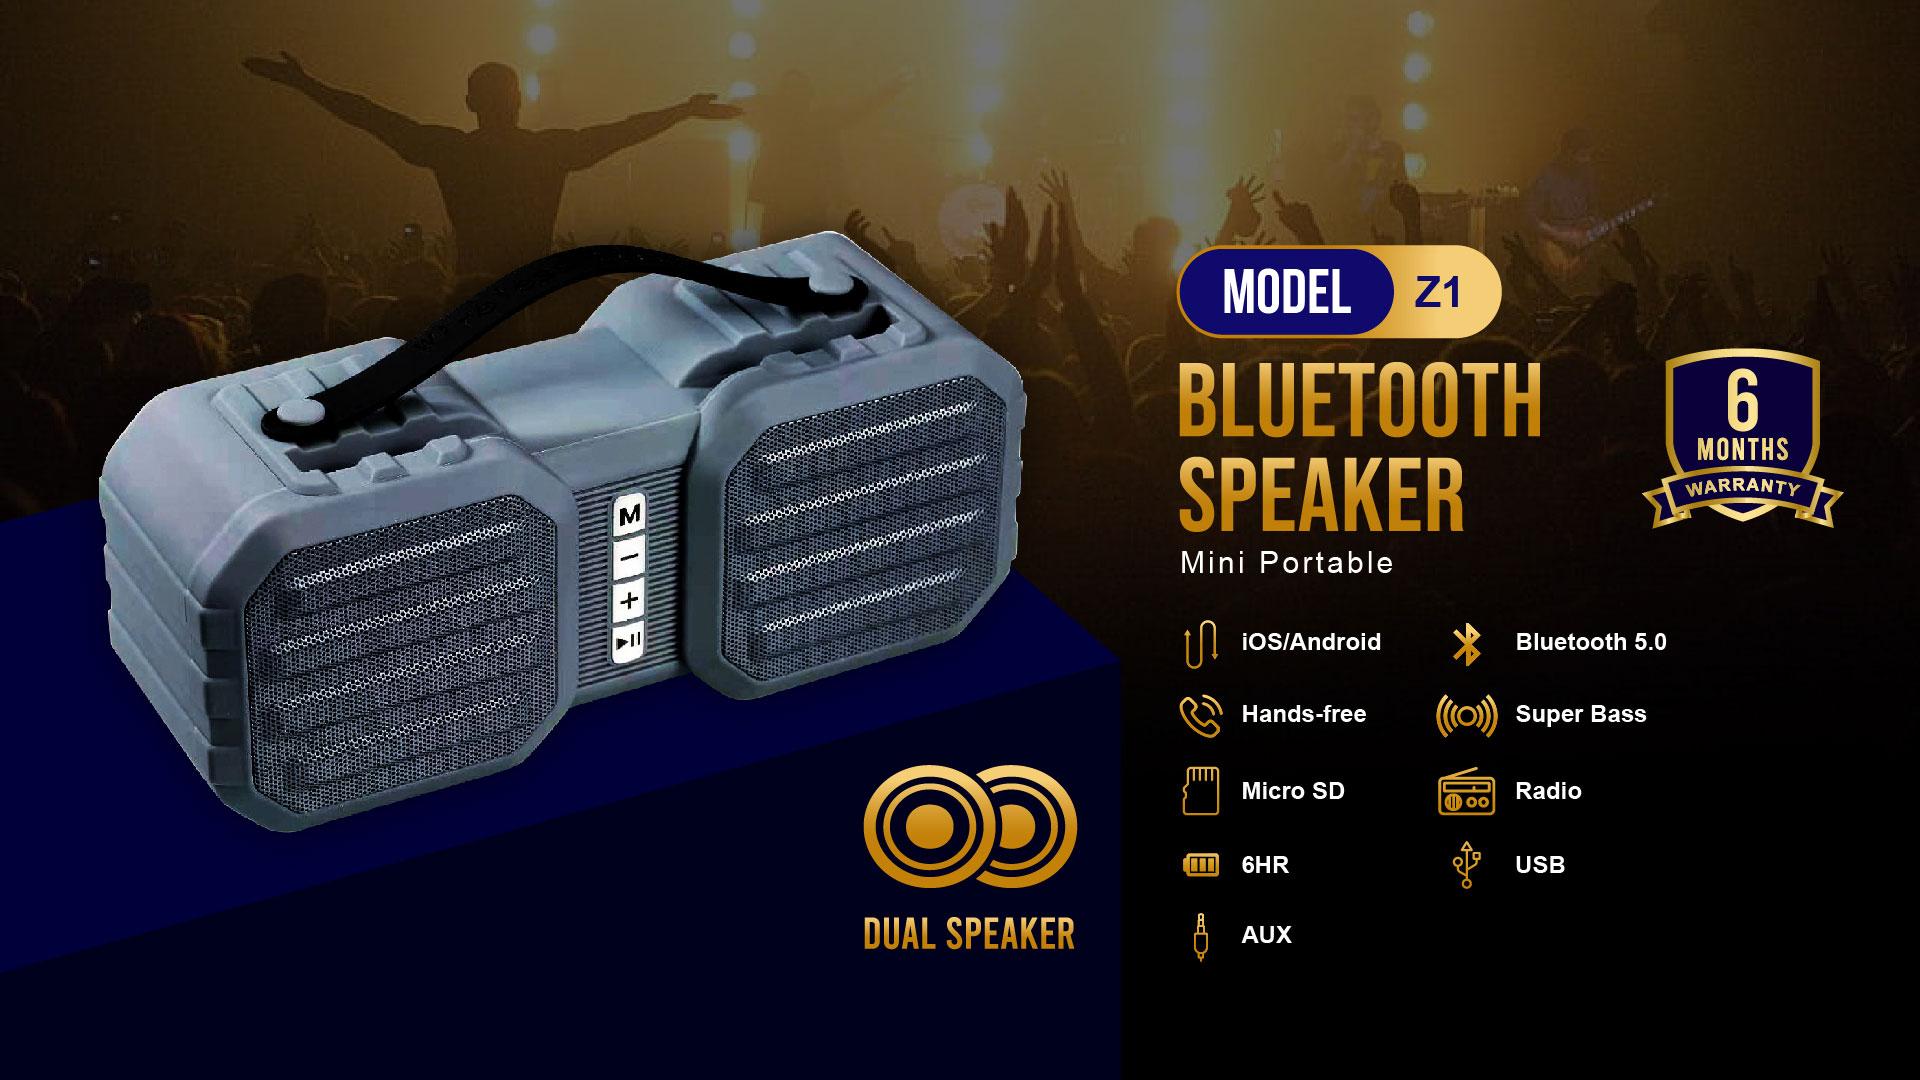 altr-ultimate-ecommerce_gpower_wdd_home_graphic_main-slider_20200310-intro-bluetooth-speaker-z1.jpg